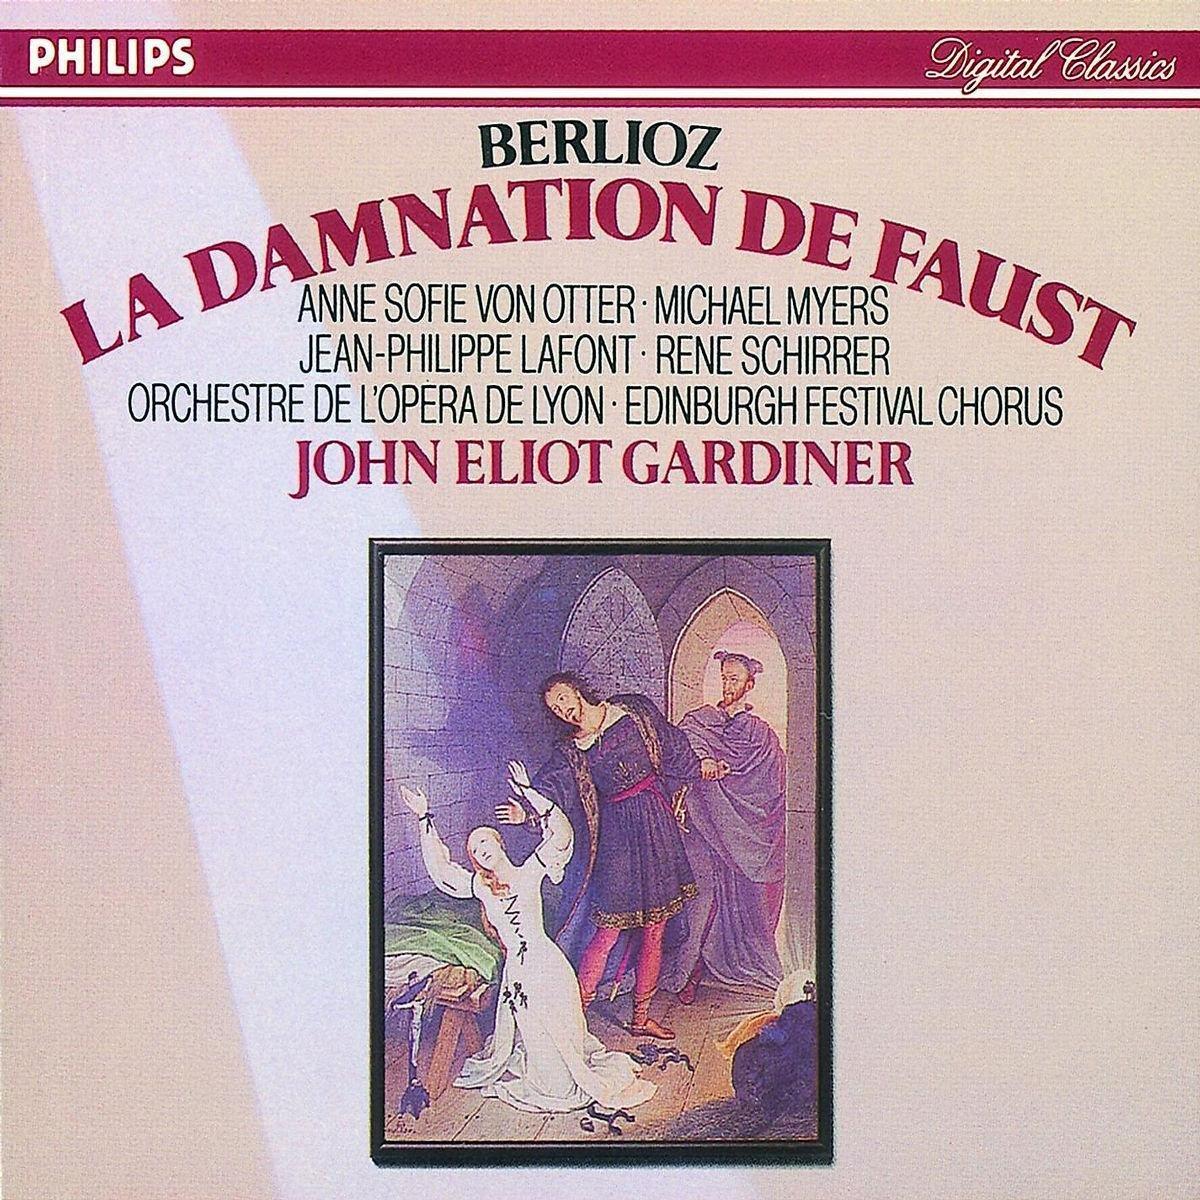 Anne Sofie Von Otter Michael Myers Berlioz John Eliot Gardiner  # Meubles De Tele Berlioz